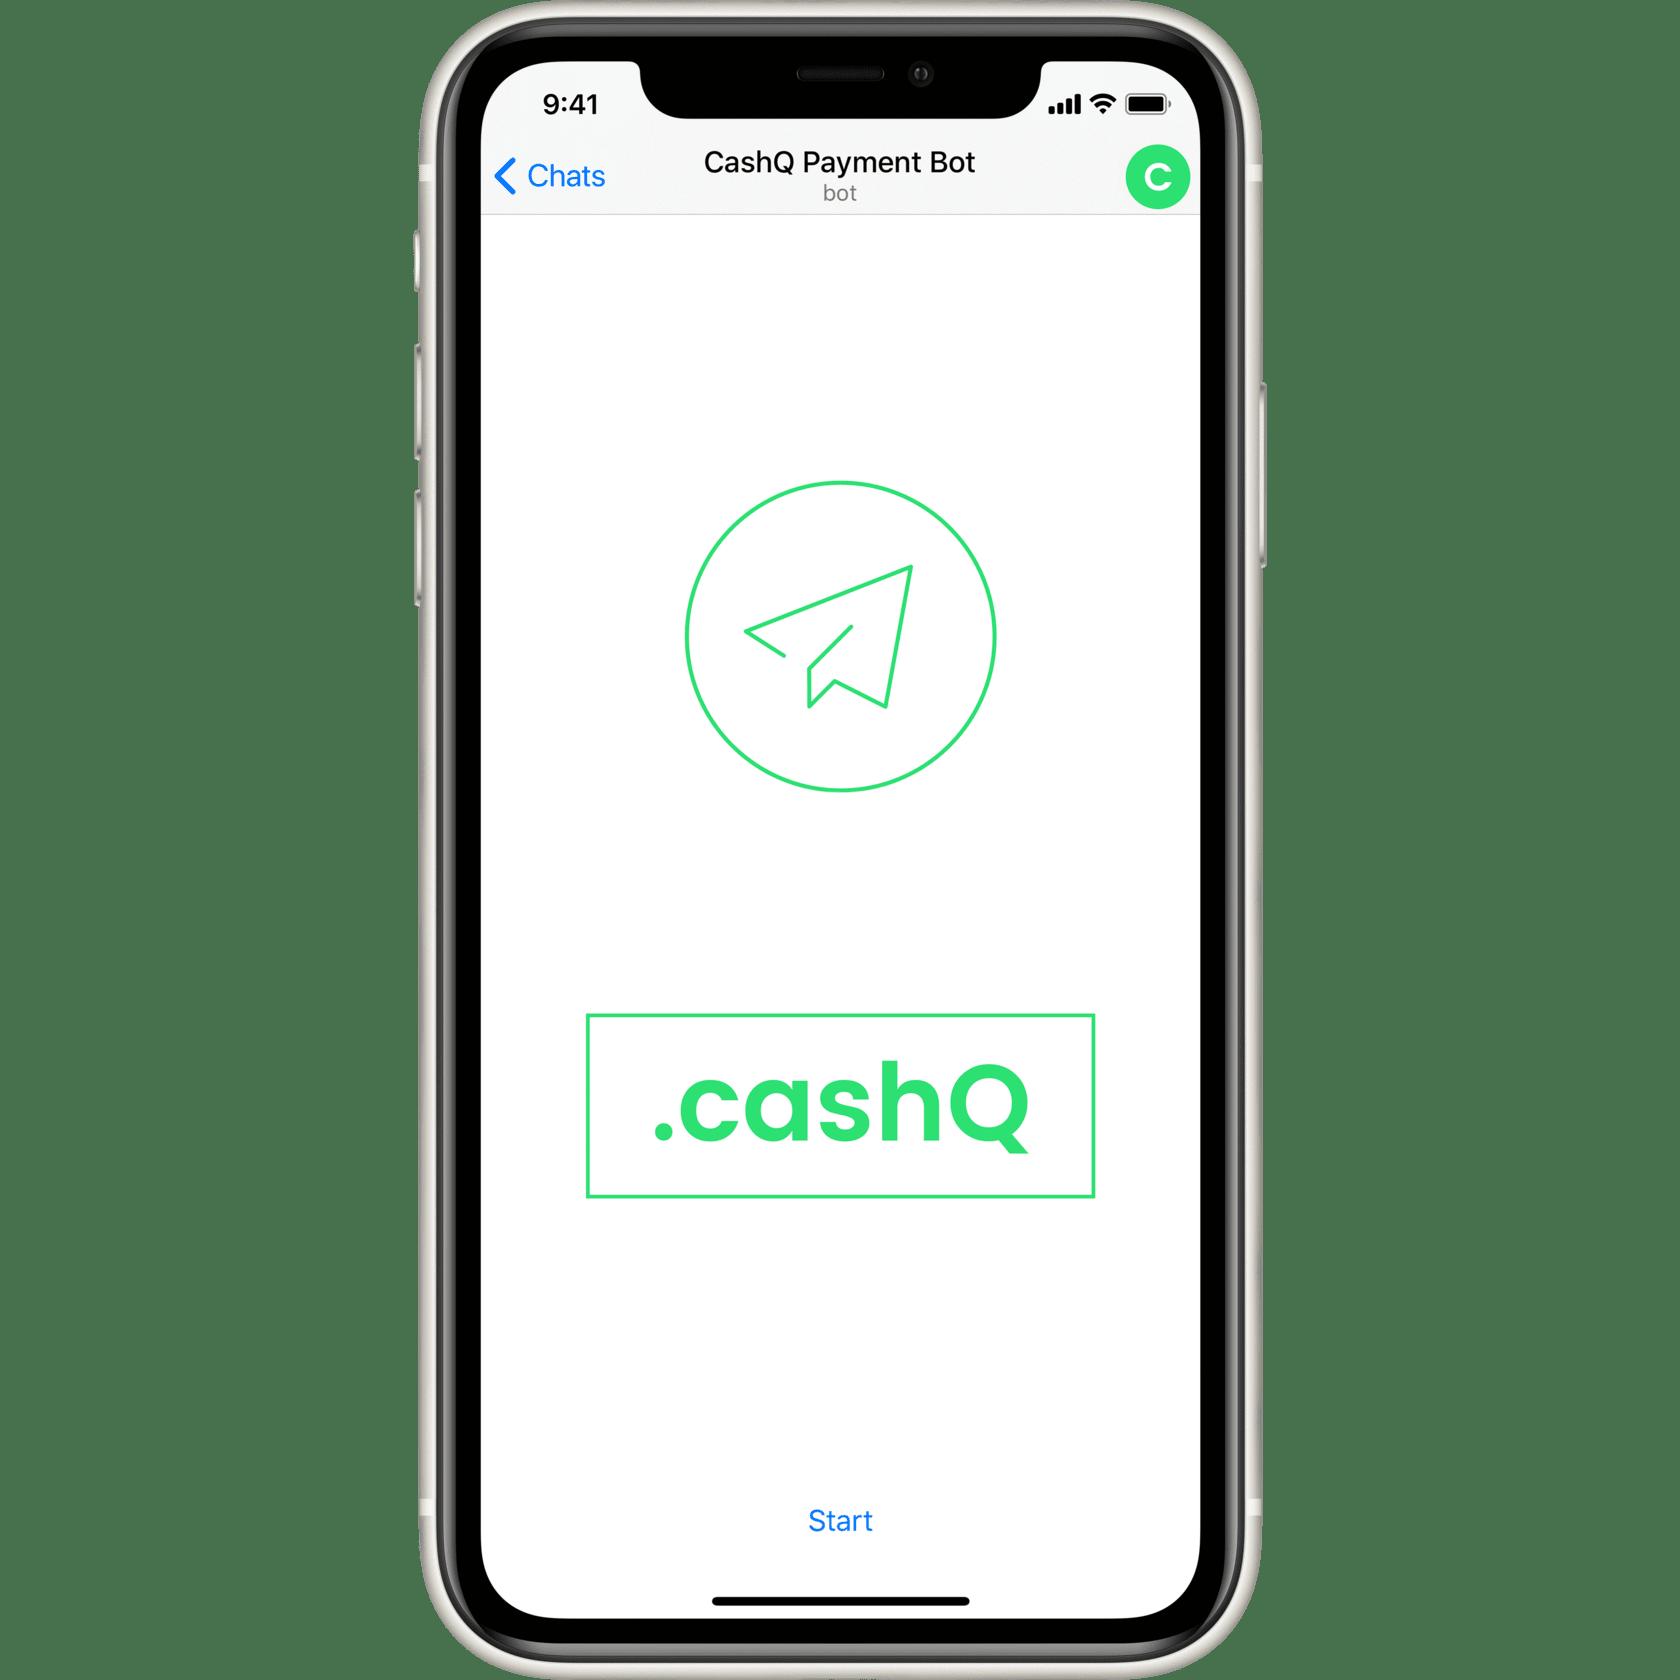 CashQ bot